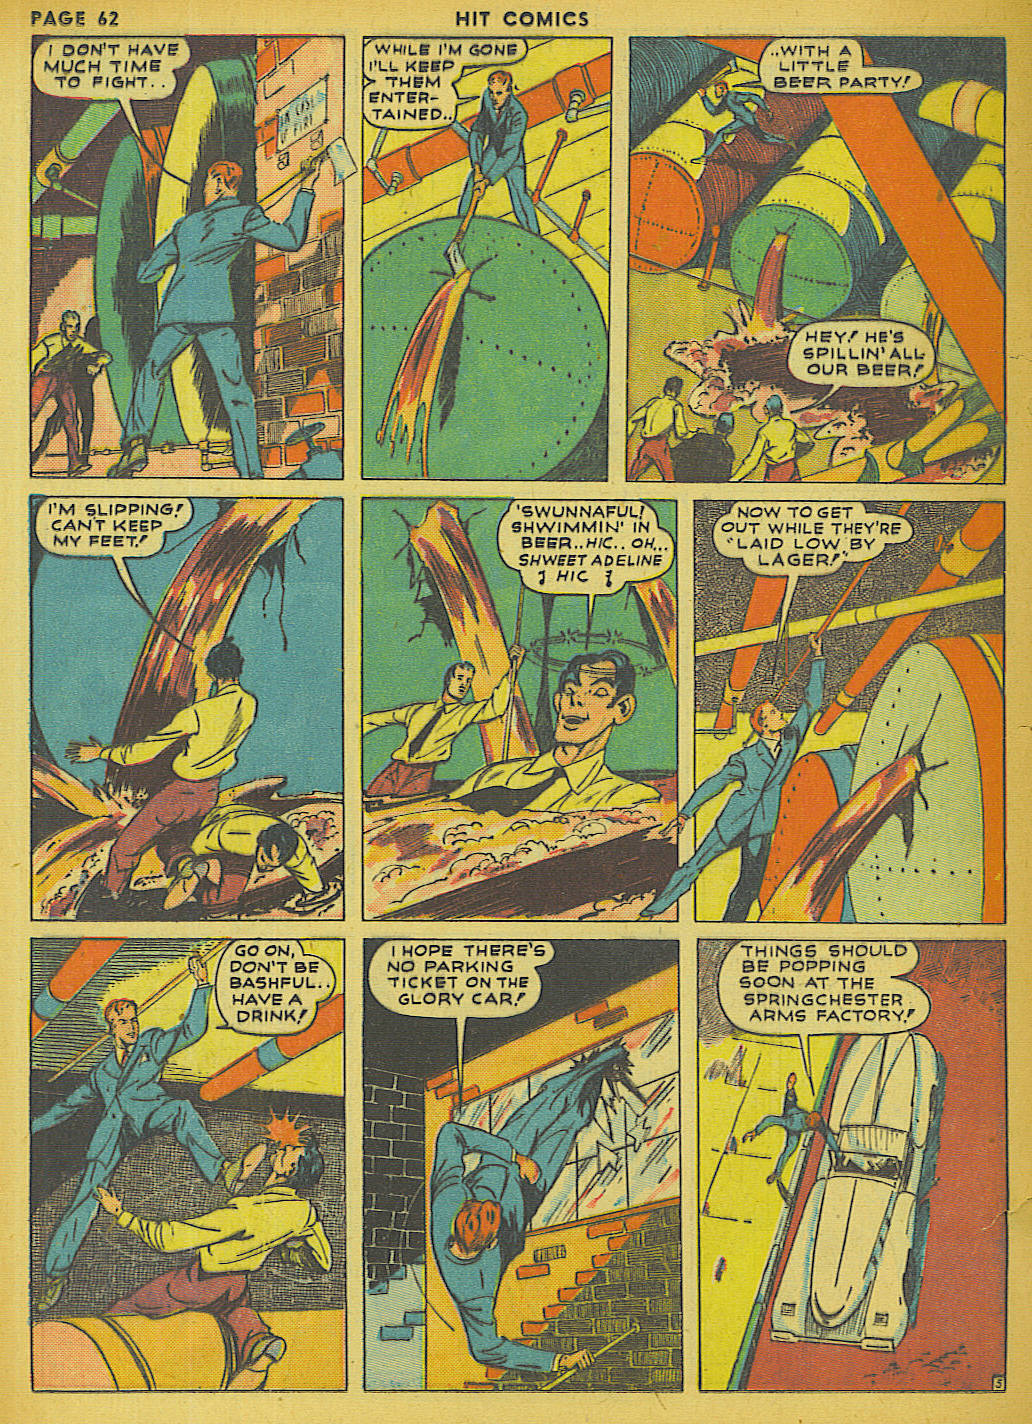 Read online Hit Comics comic -  Issue #13 - 64